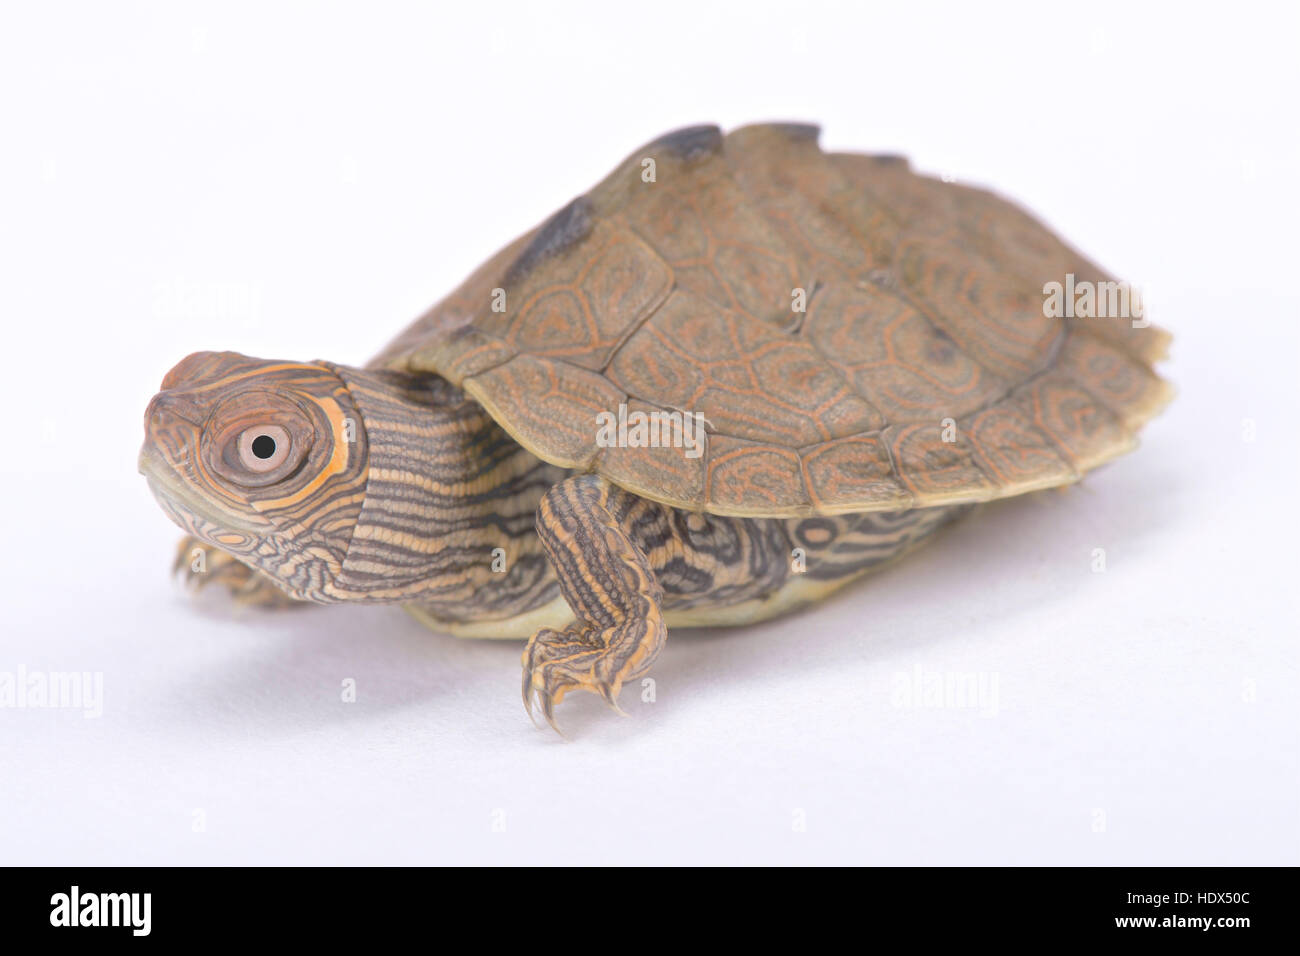 Mississippi map turtle, Graptemys pseudogeographica kohni - Stock Image